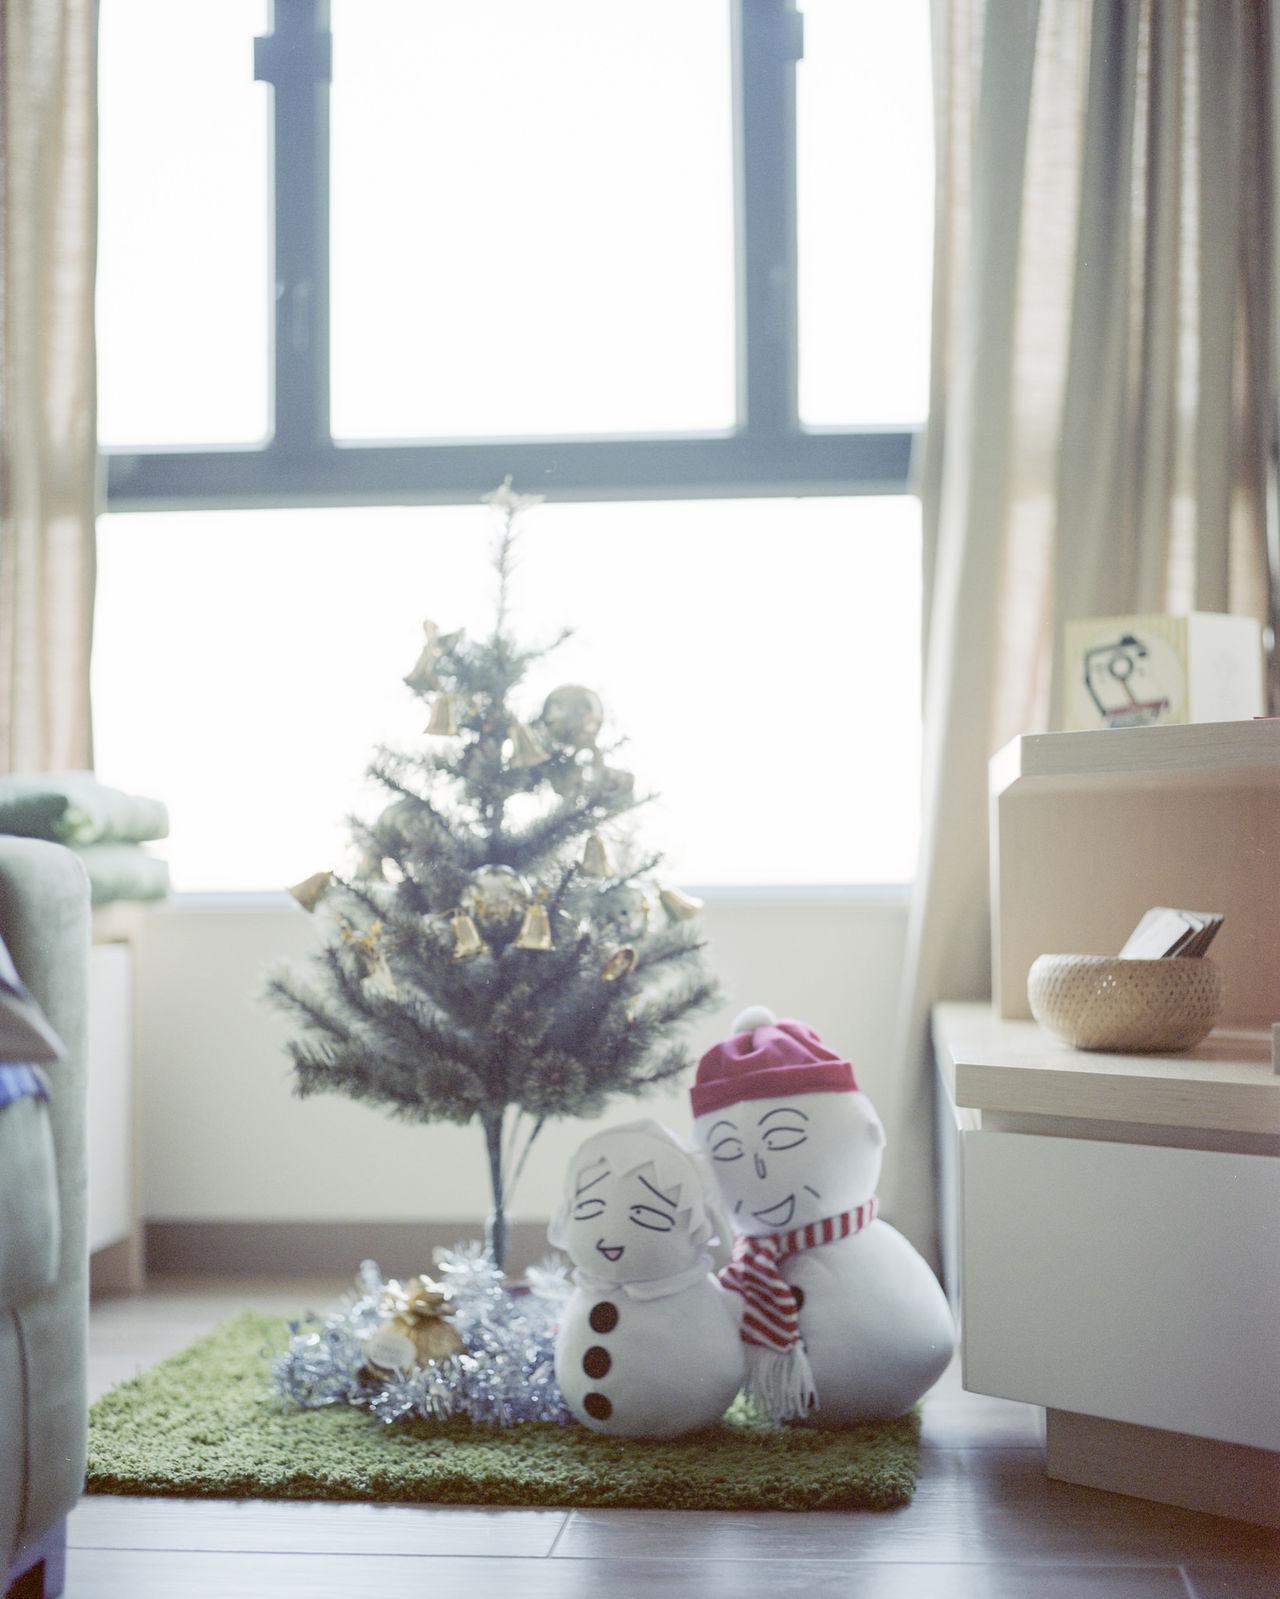 Beautiful stock photos of schneemann, window, christmas, indoors, christmas tree